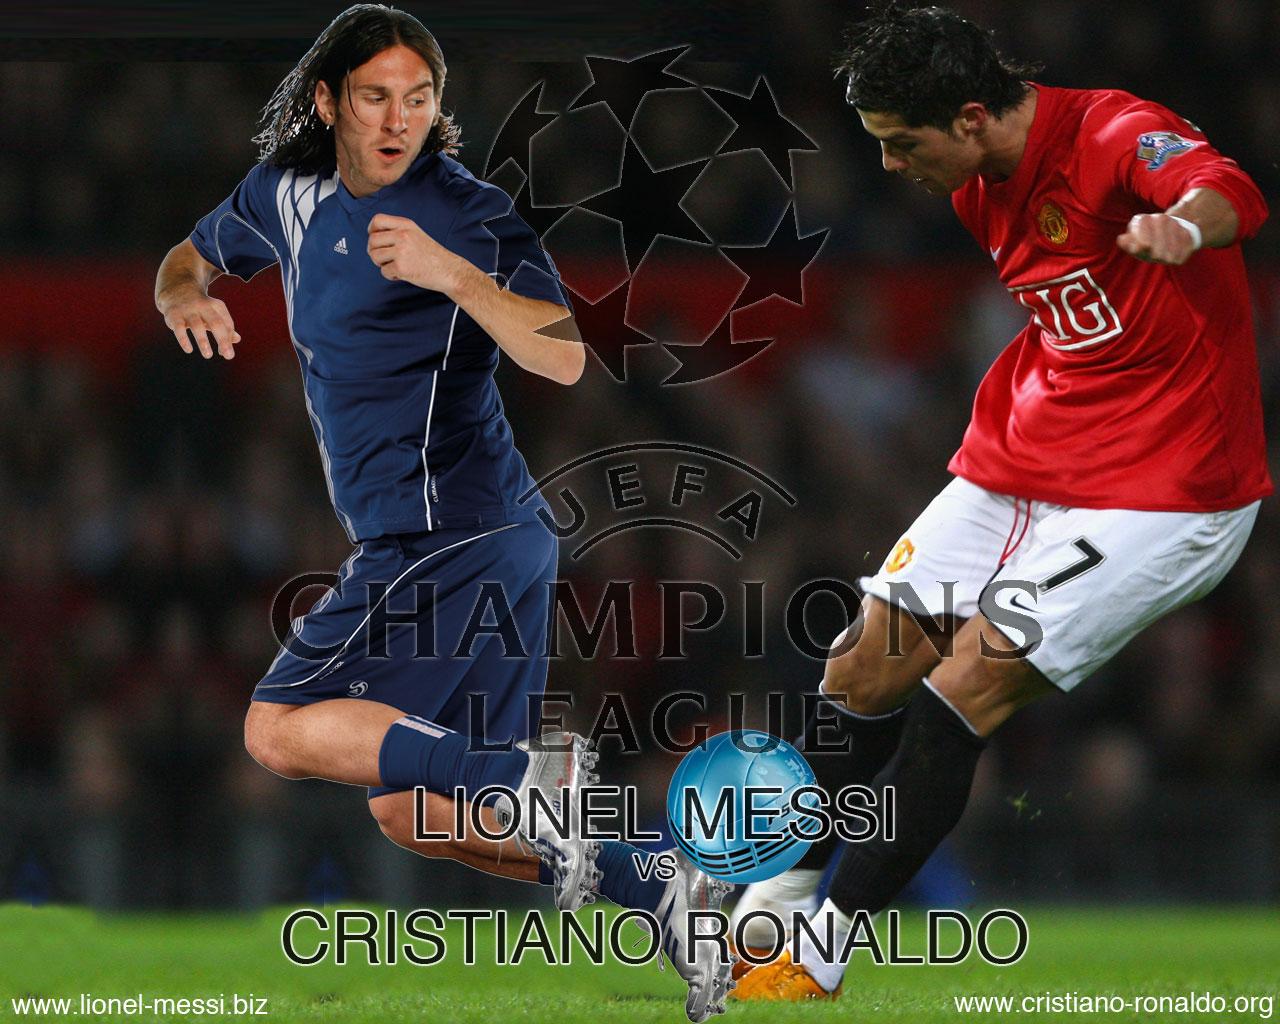 http://1.bp.blogspot.com/_dp6zXNCIKjk/TTAbDw-7wrI/AAAAAAAAAFU/gStwdReHurs/s1600/lionel-messi-vs-cristiano-ronaldo-73.jpg